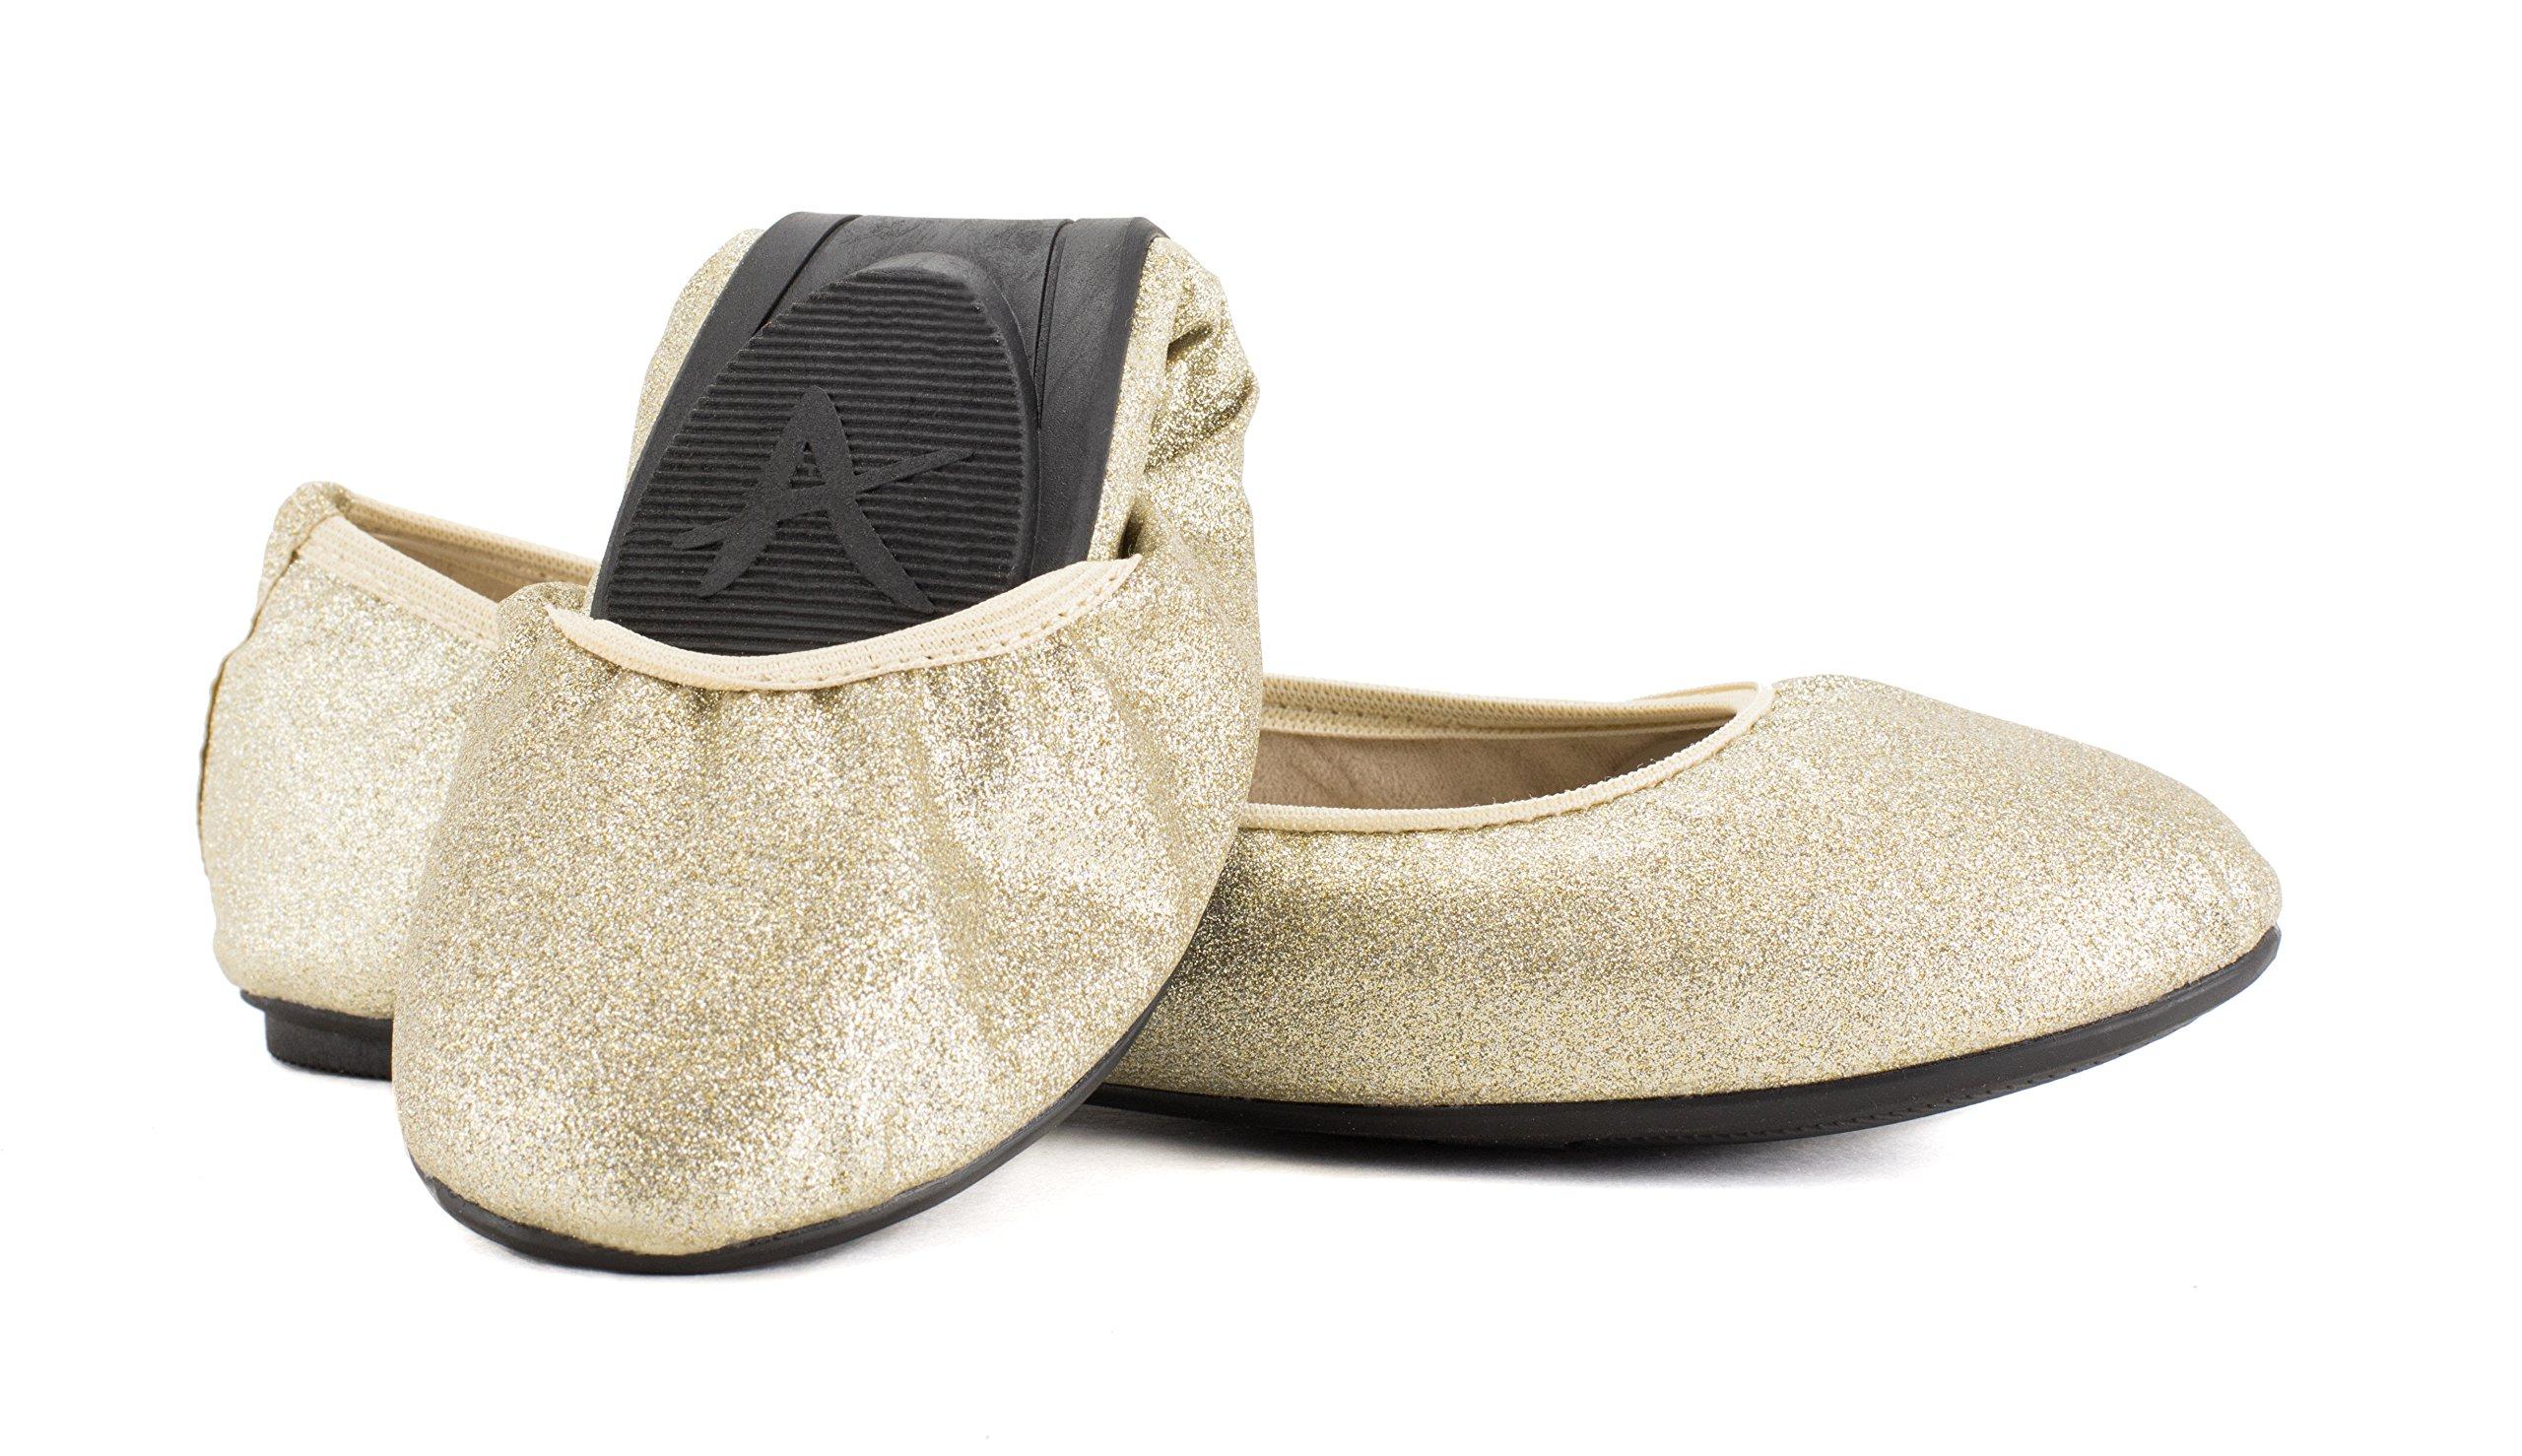 Avanti Skyler Foldable Ballet Flats - Travel Shoes (8, Gold)